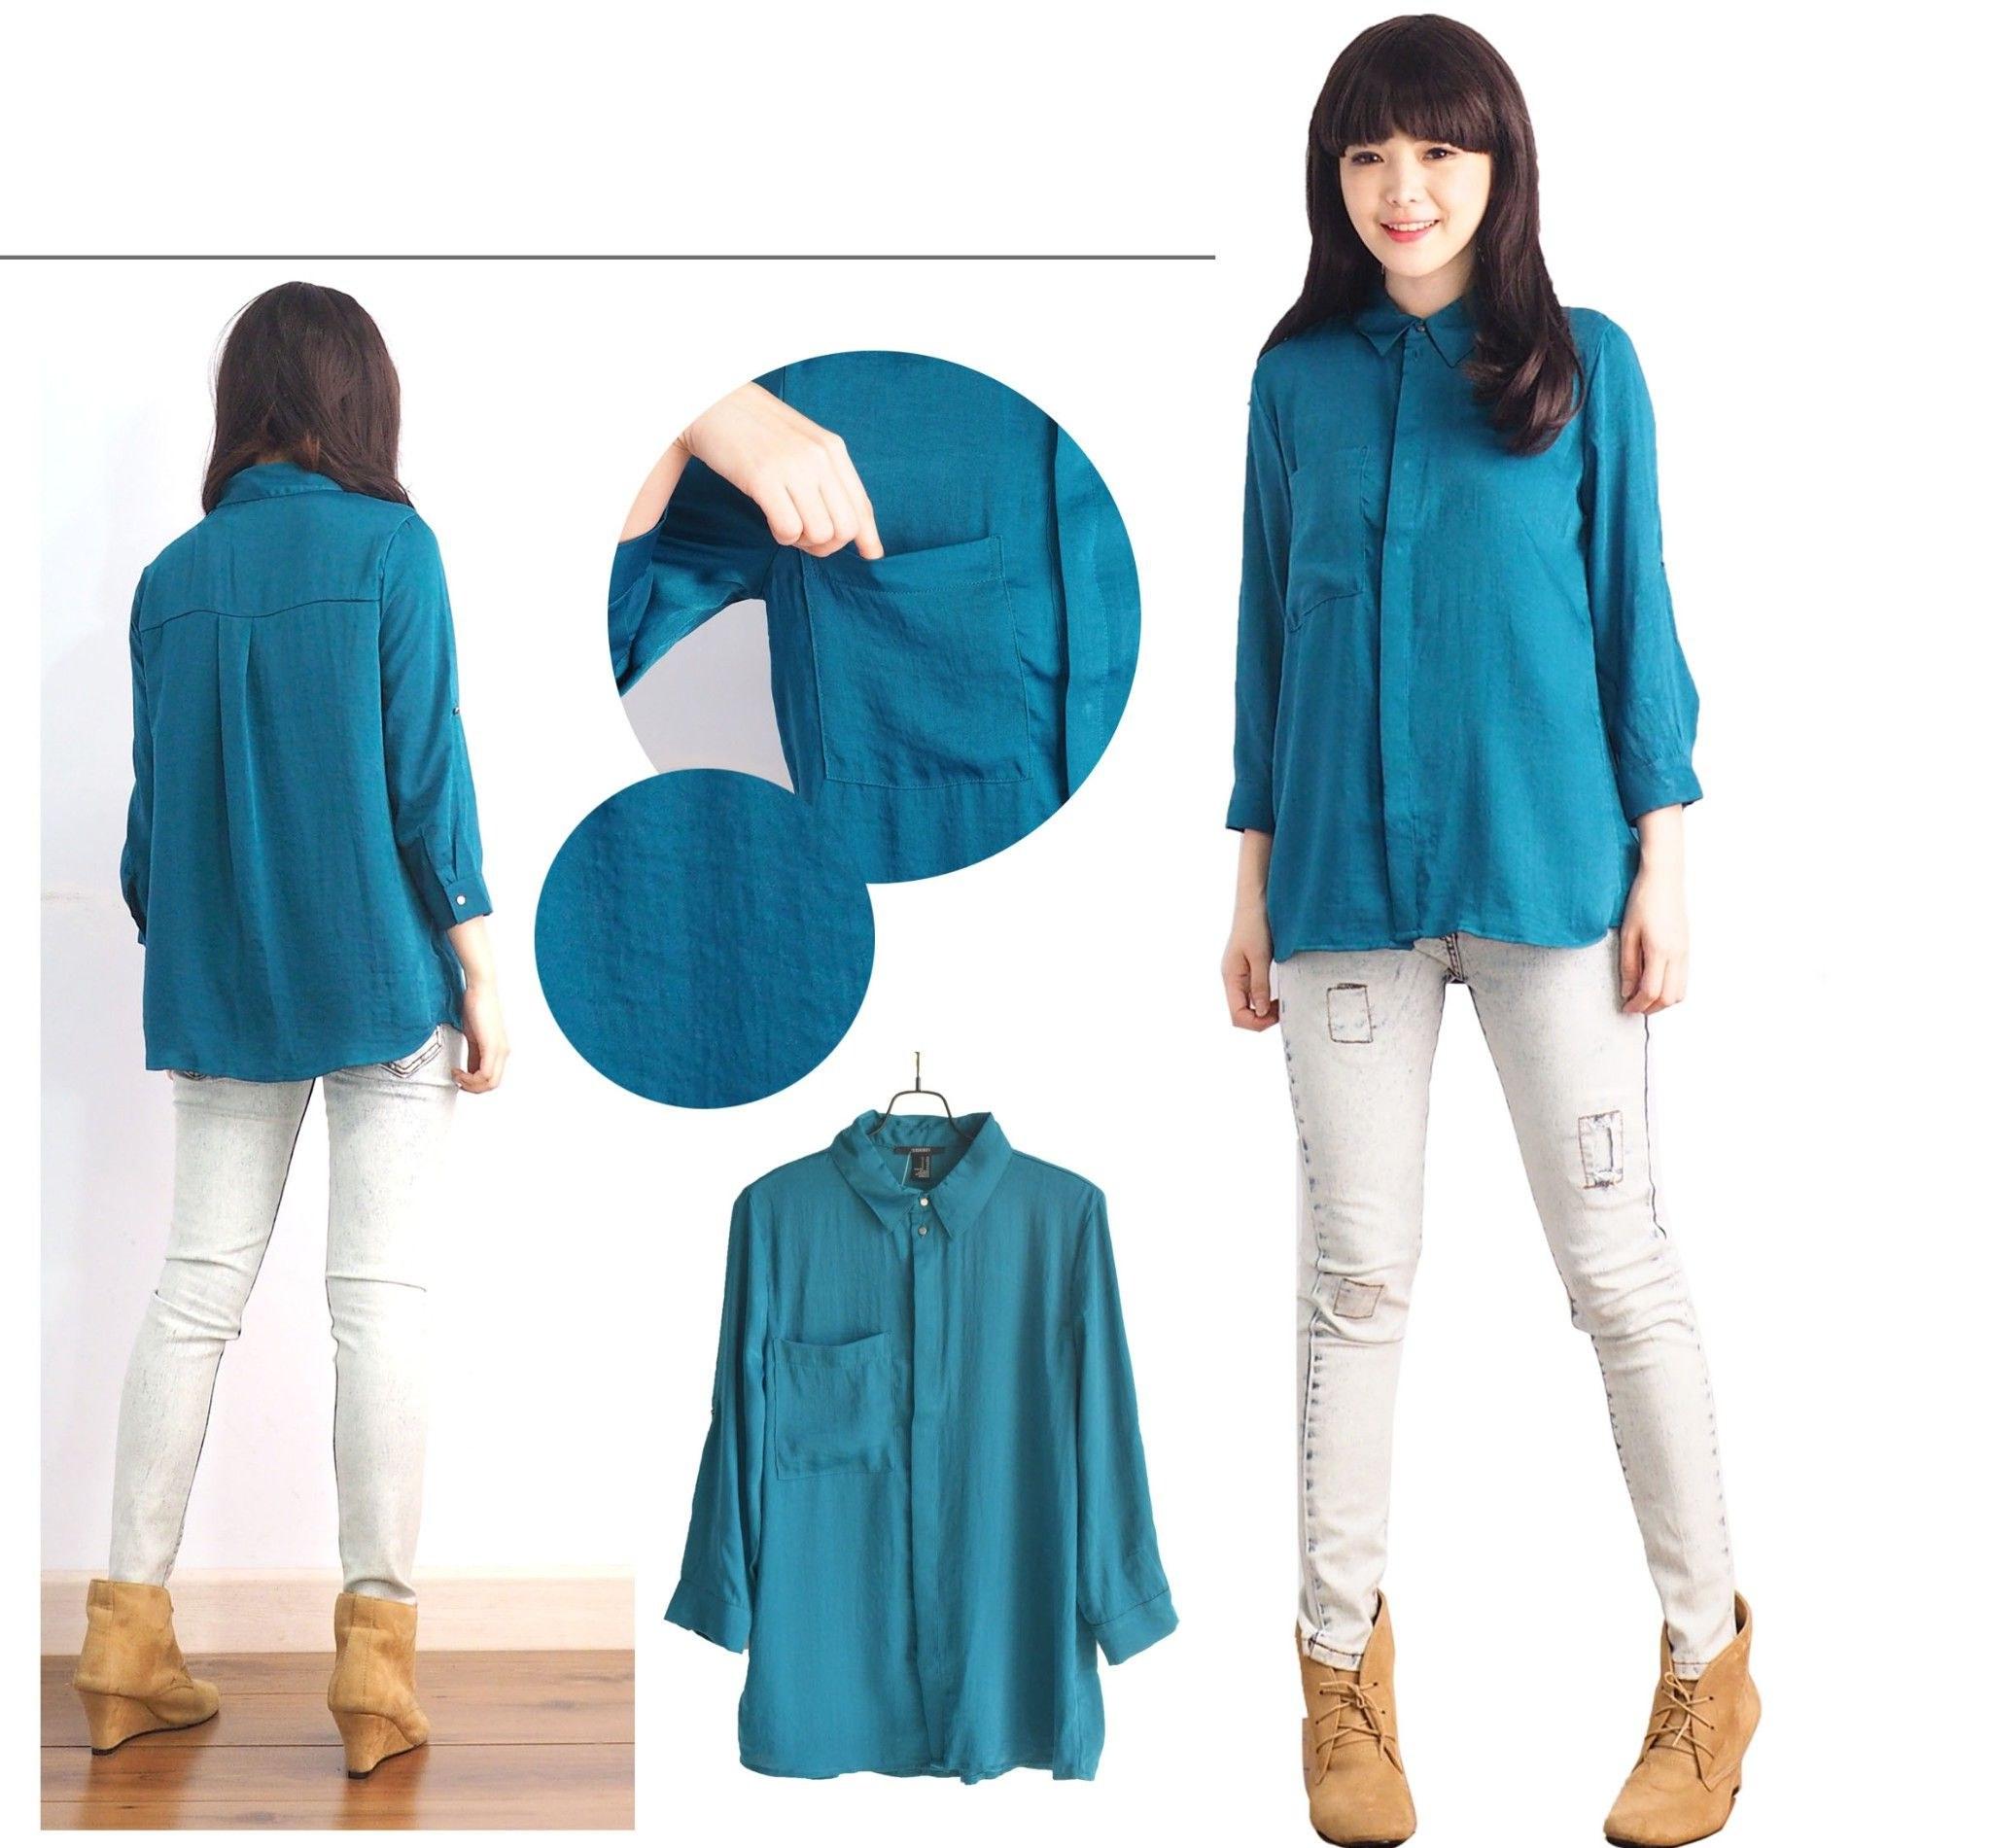 Model Model Baju Lebaran Terbaru Wanita U3dh Blouse Muslim Model Pakaian Wanita Terbaru Pakaian Bayi